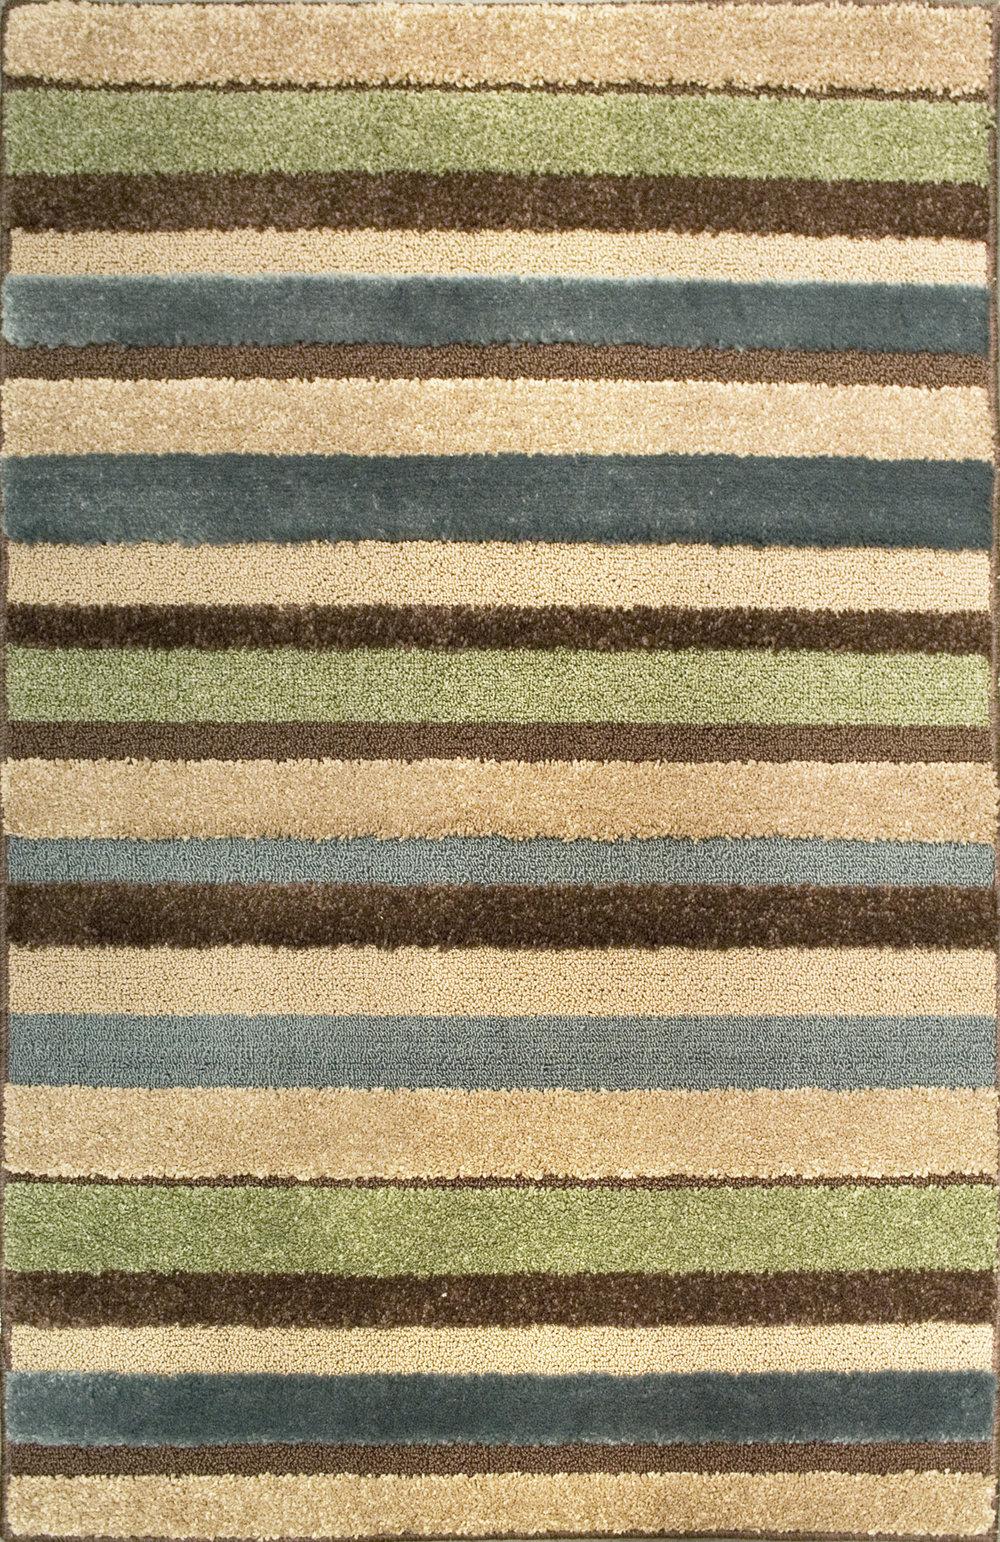 Colorful Stripes Door Mat.jpg